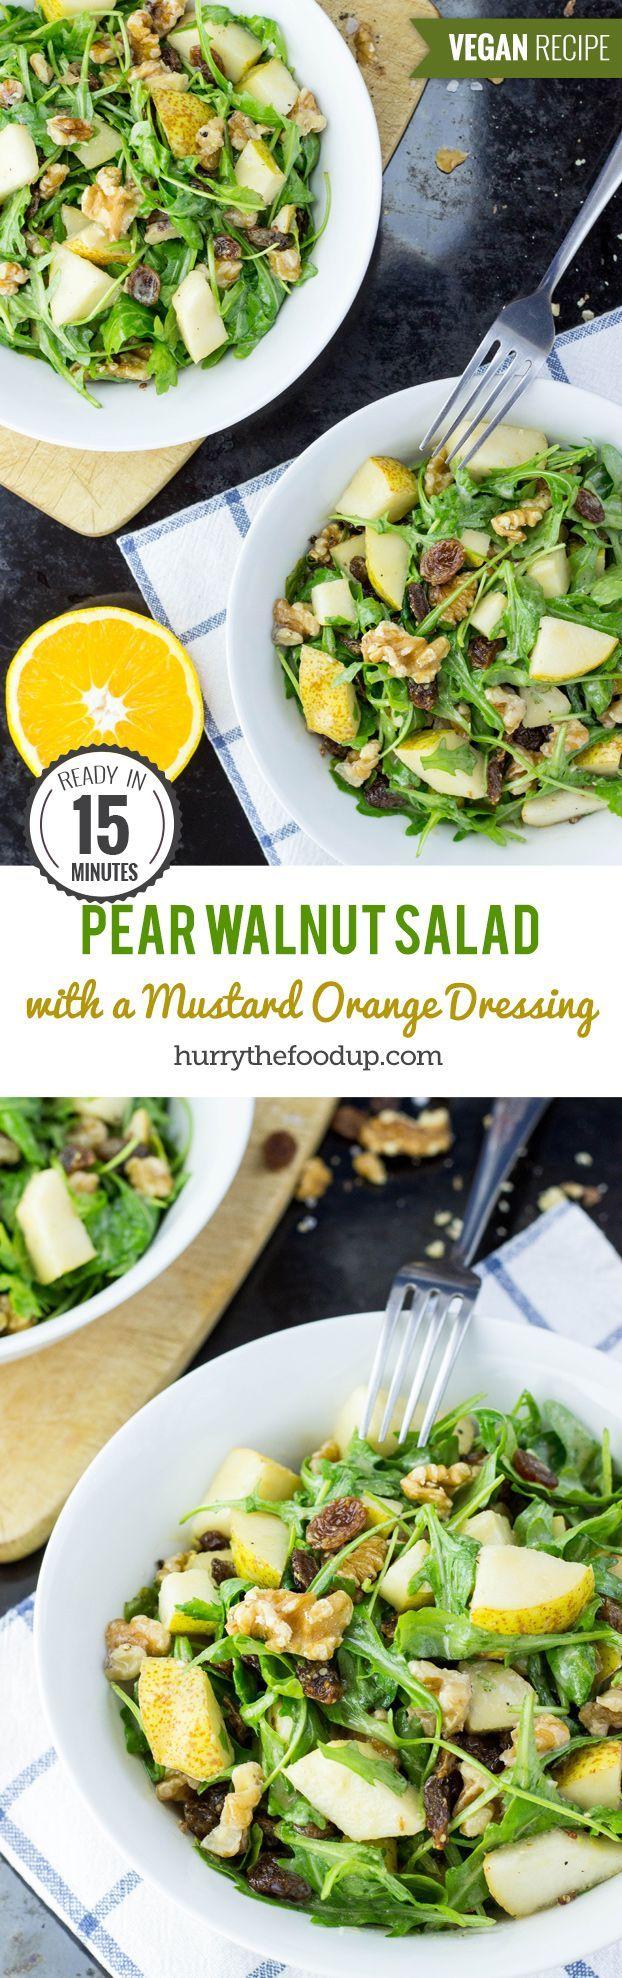 Crunchy Pear Walnut Salad with a Mustard Orange Dressing #vegan #salad   hurrythefoodup.com